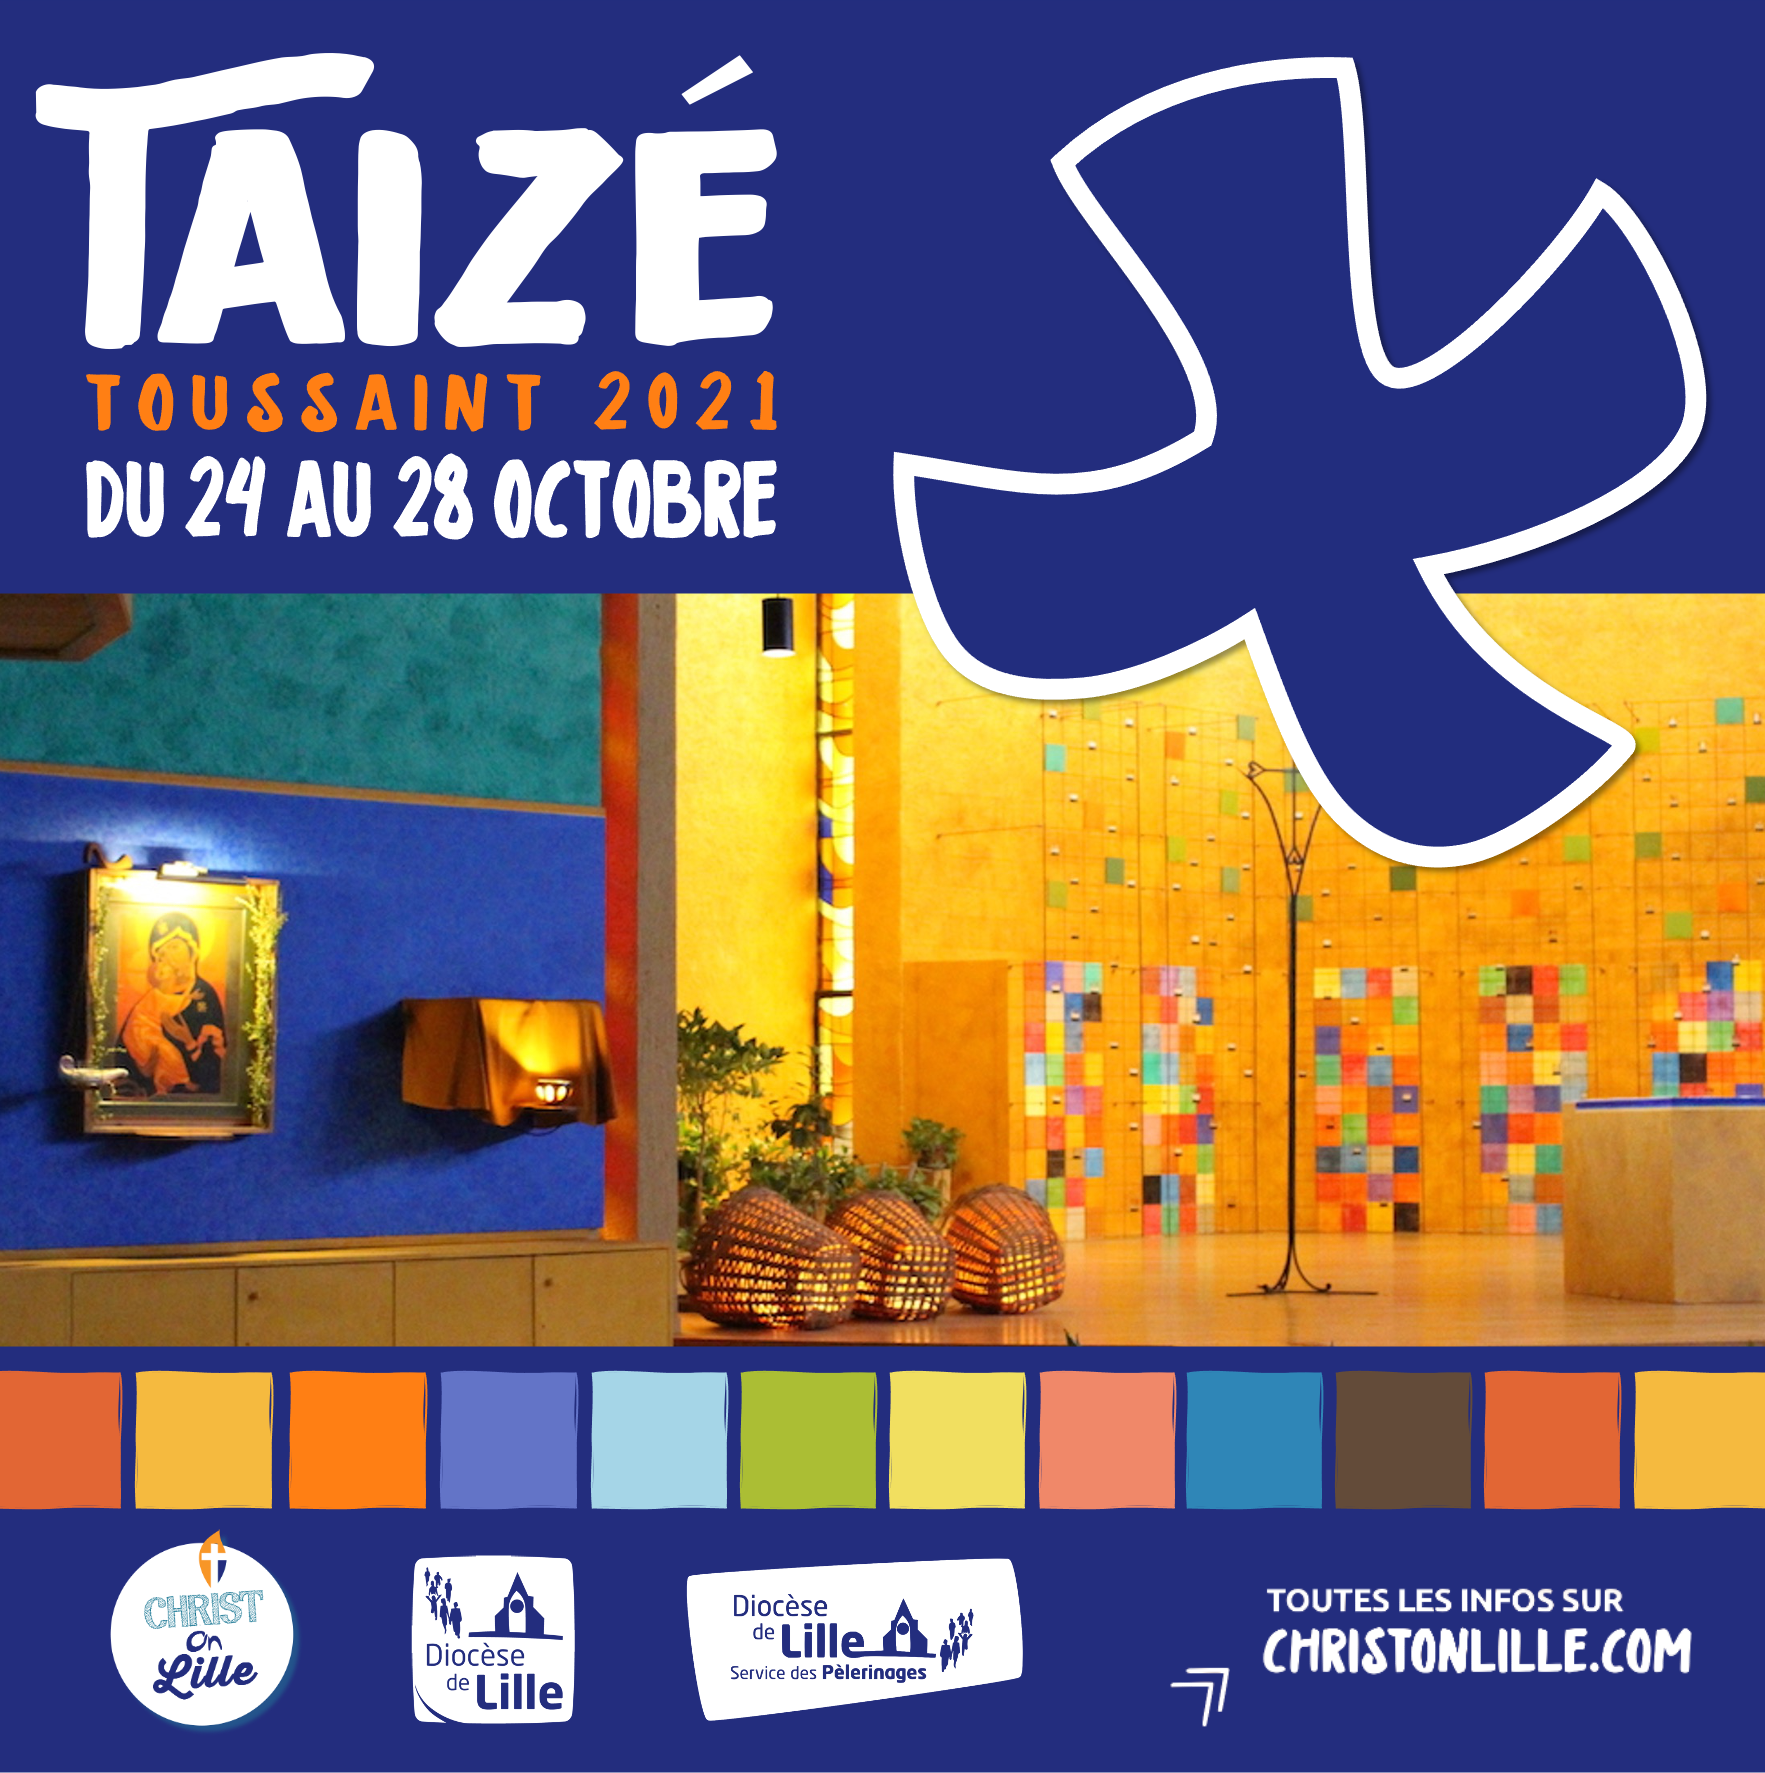 Image d'illustration Taizé 2021